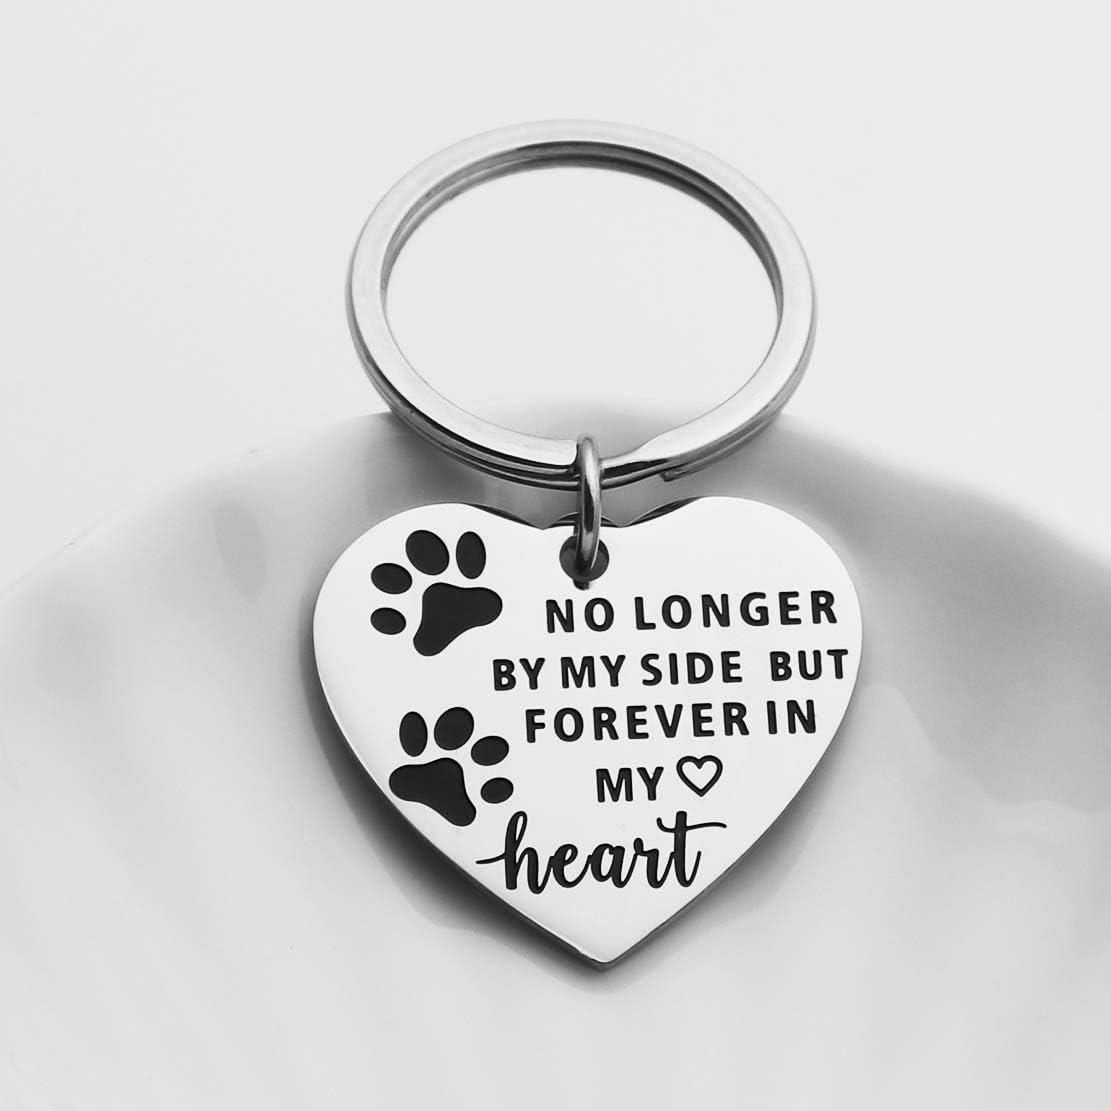 JINGMARUO Dog Cat Pet Memorial Keychain Pet Remembrance Gift Sympathy Gift for Loss of Pet